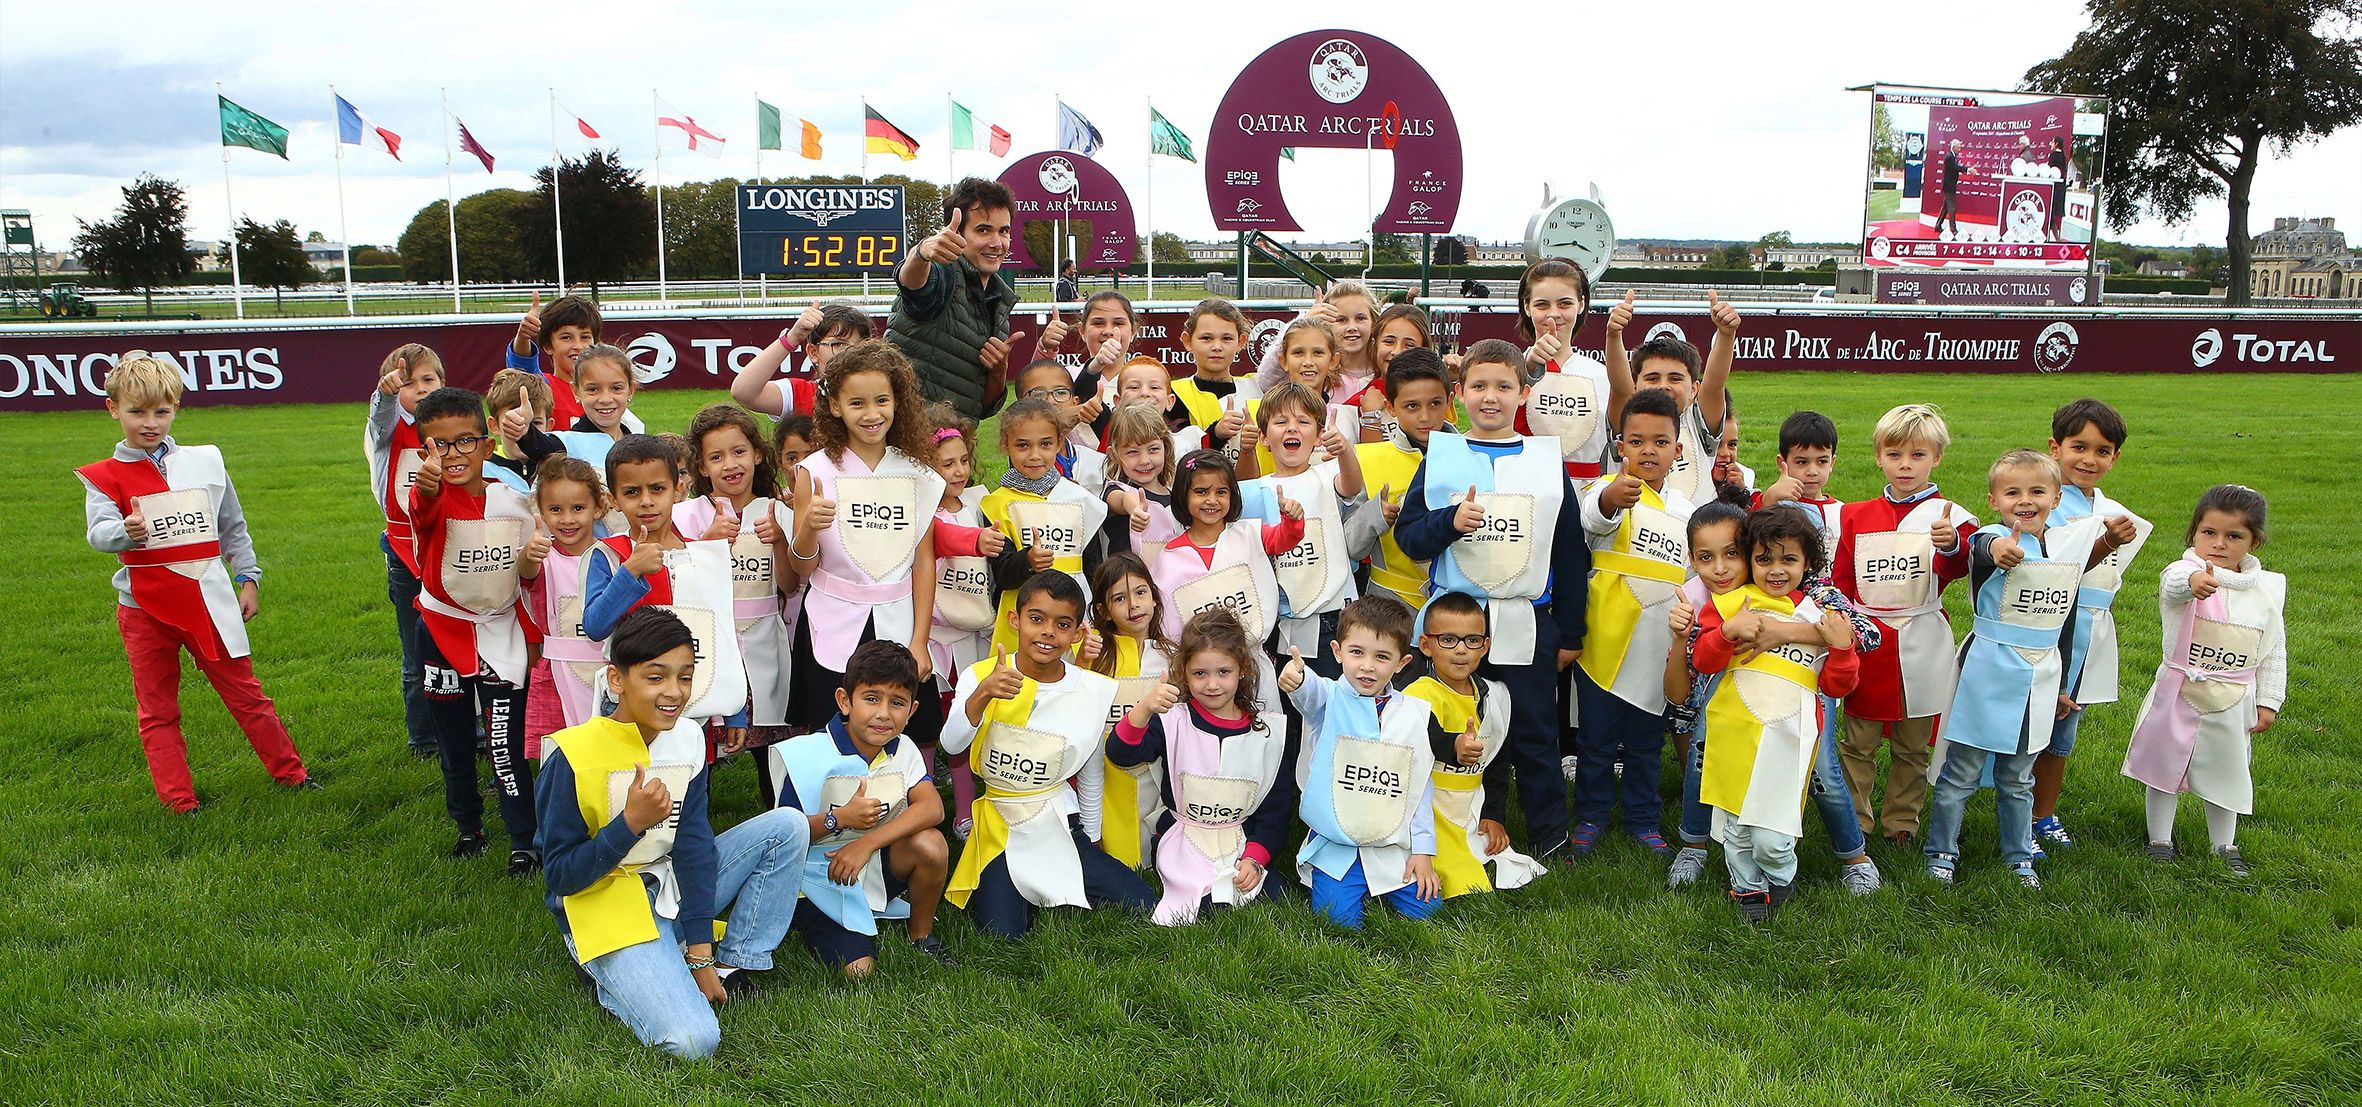 rte-la-course-epiqe-kids-2.jpg